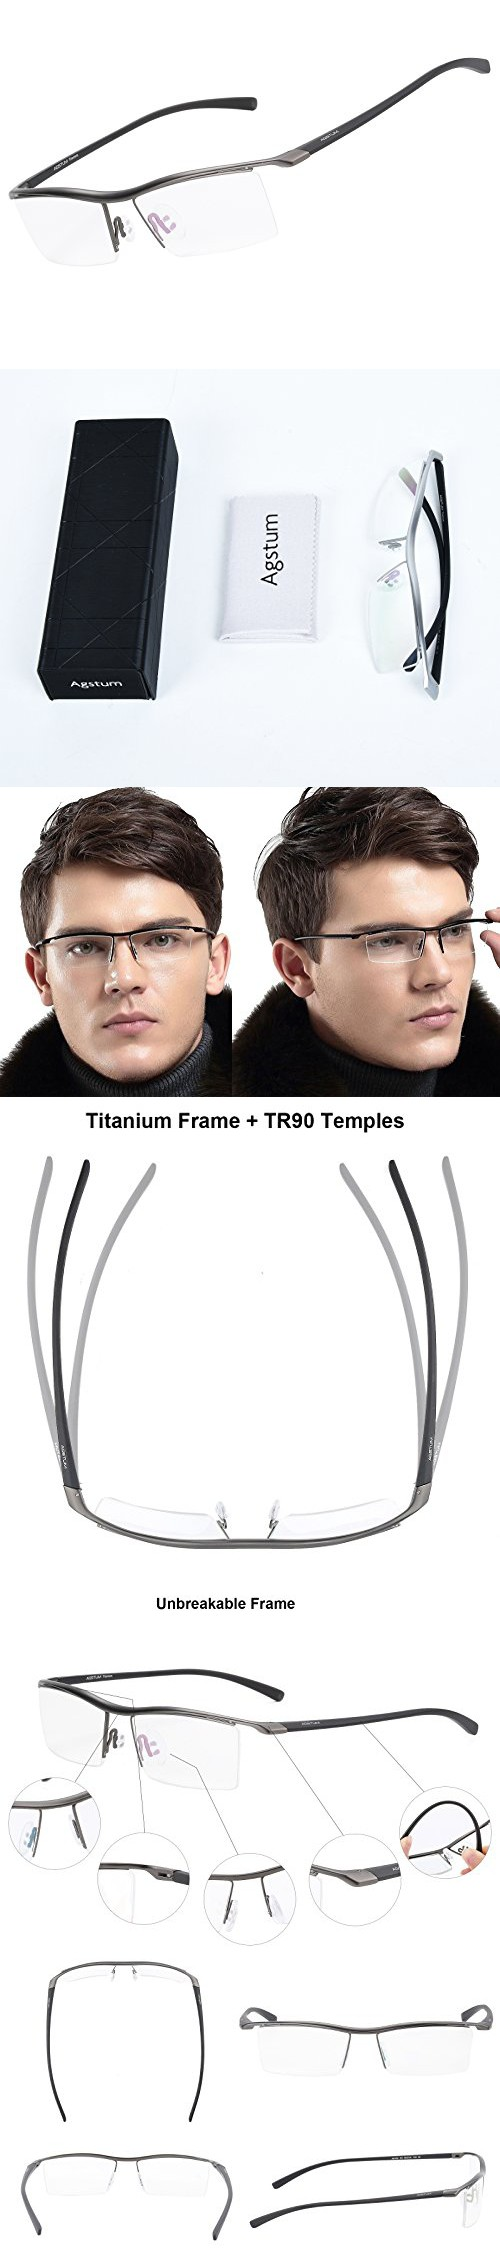 d4e3a071596 Agstum Pure Titanium Half Rimless Business Glasses Frame Optical Eyeglasses  Clear Lens (Gunmetal) Glasses